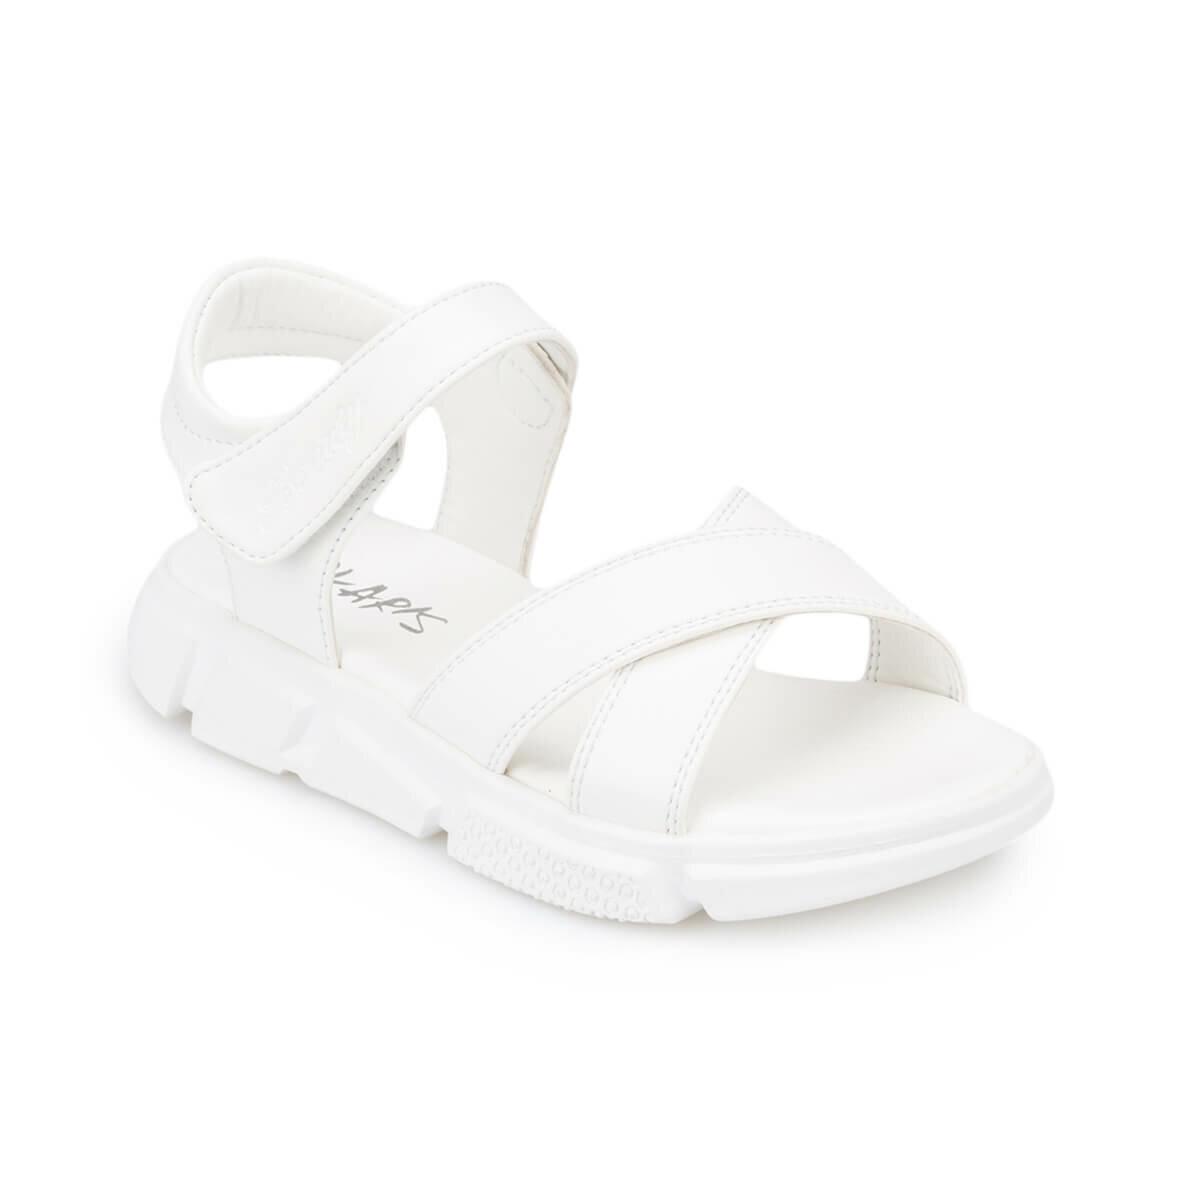 FLO 91. 511263.F White Female Child Sandals Polaris